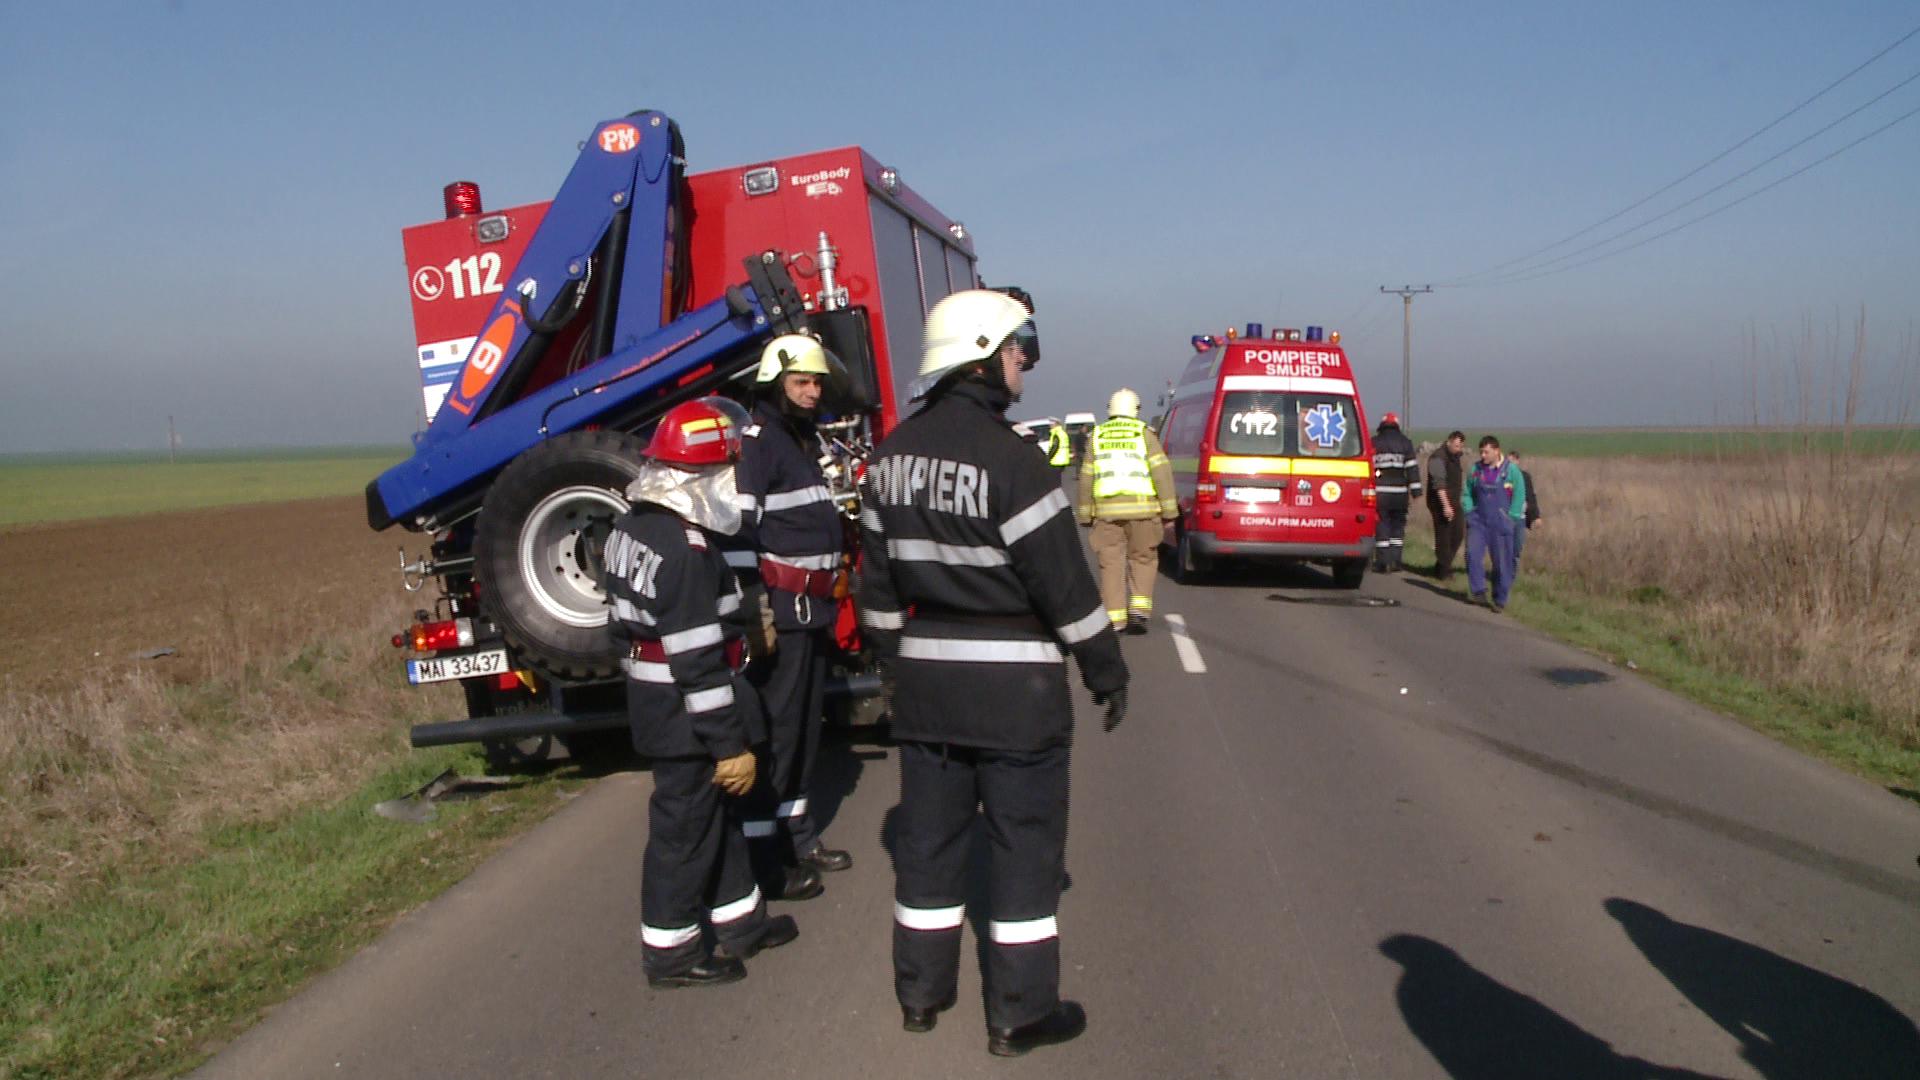 Accident teribil petrecut in aceasta dupa-amiaza in Maramures. Un sofer a fost prins sub camion, in rapa